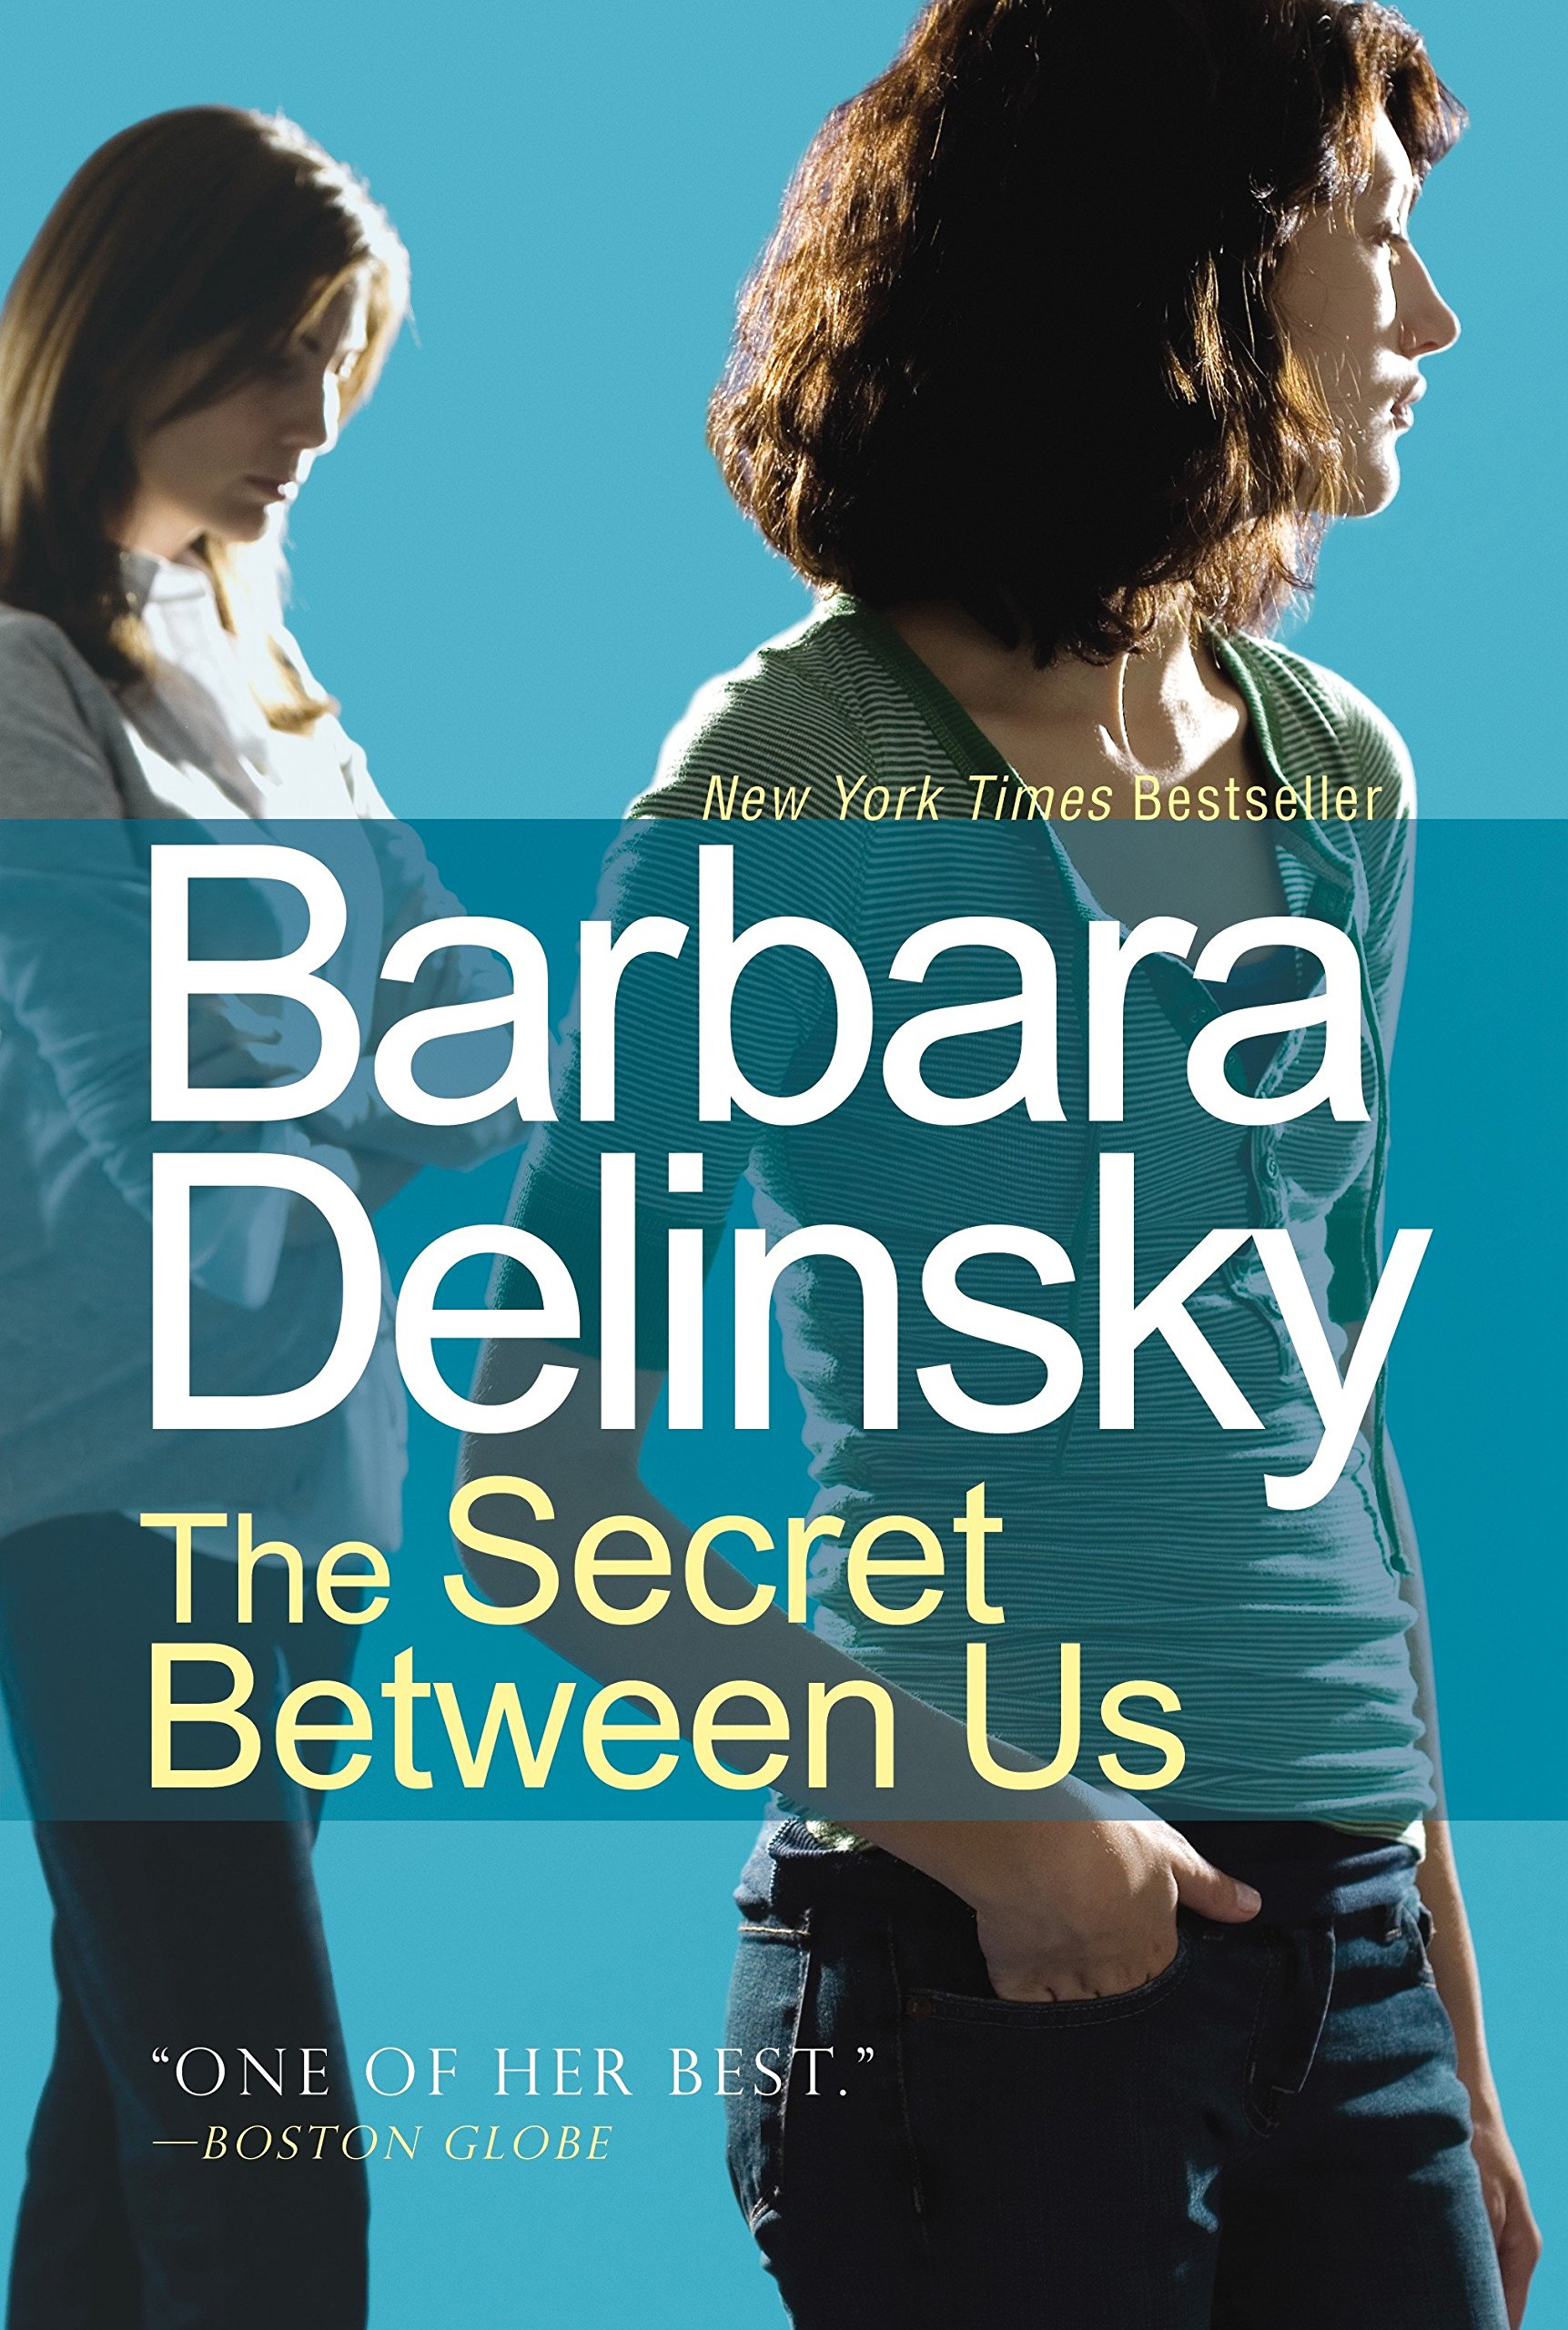 Amazon.com: The Secret Between Us (9780767925198): Barbara Delinsky: Books